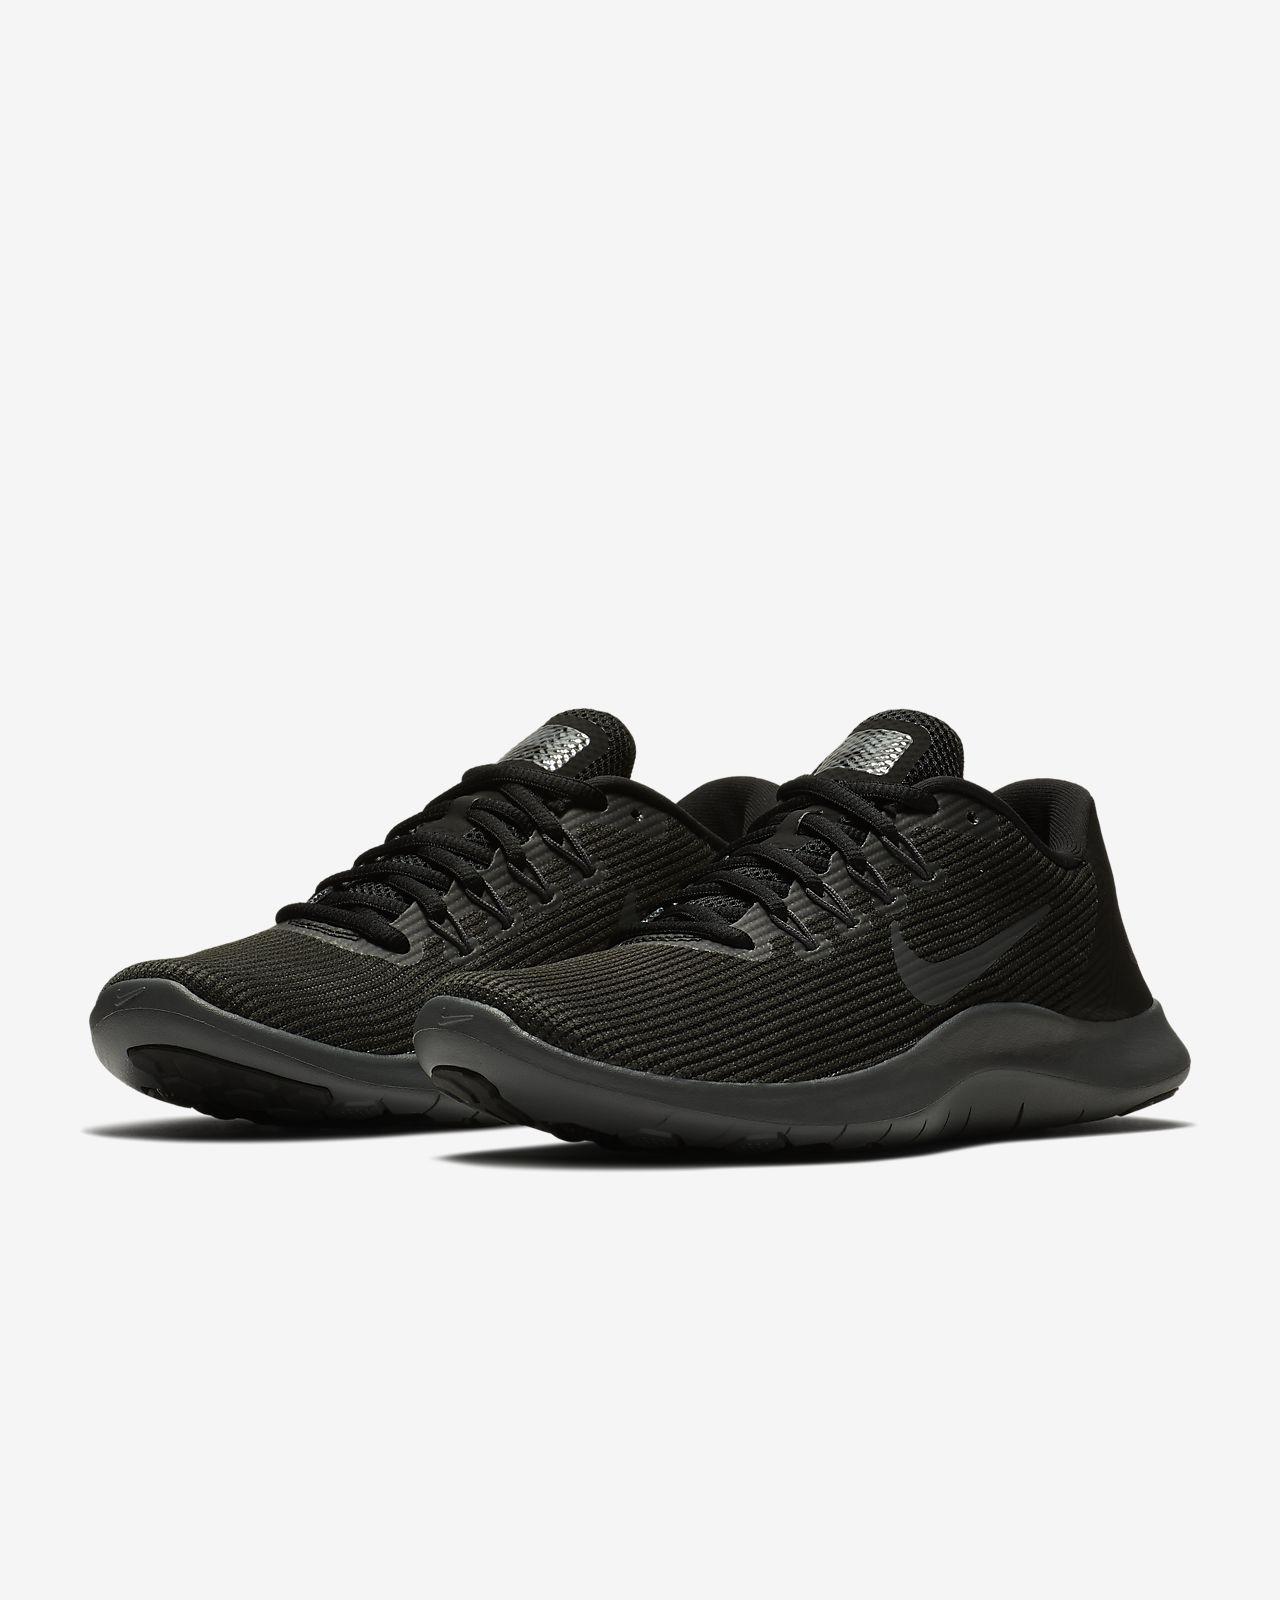 new product 09ccb ecb09 Nike Flex 2018 RN, Chaussures de Running Homme, Noir (Noir Anthracite